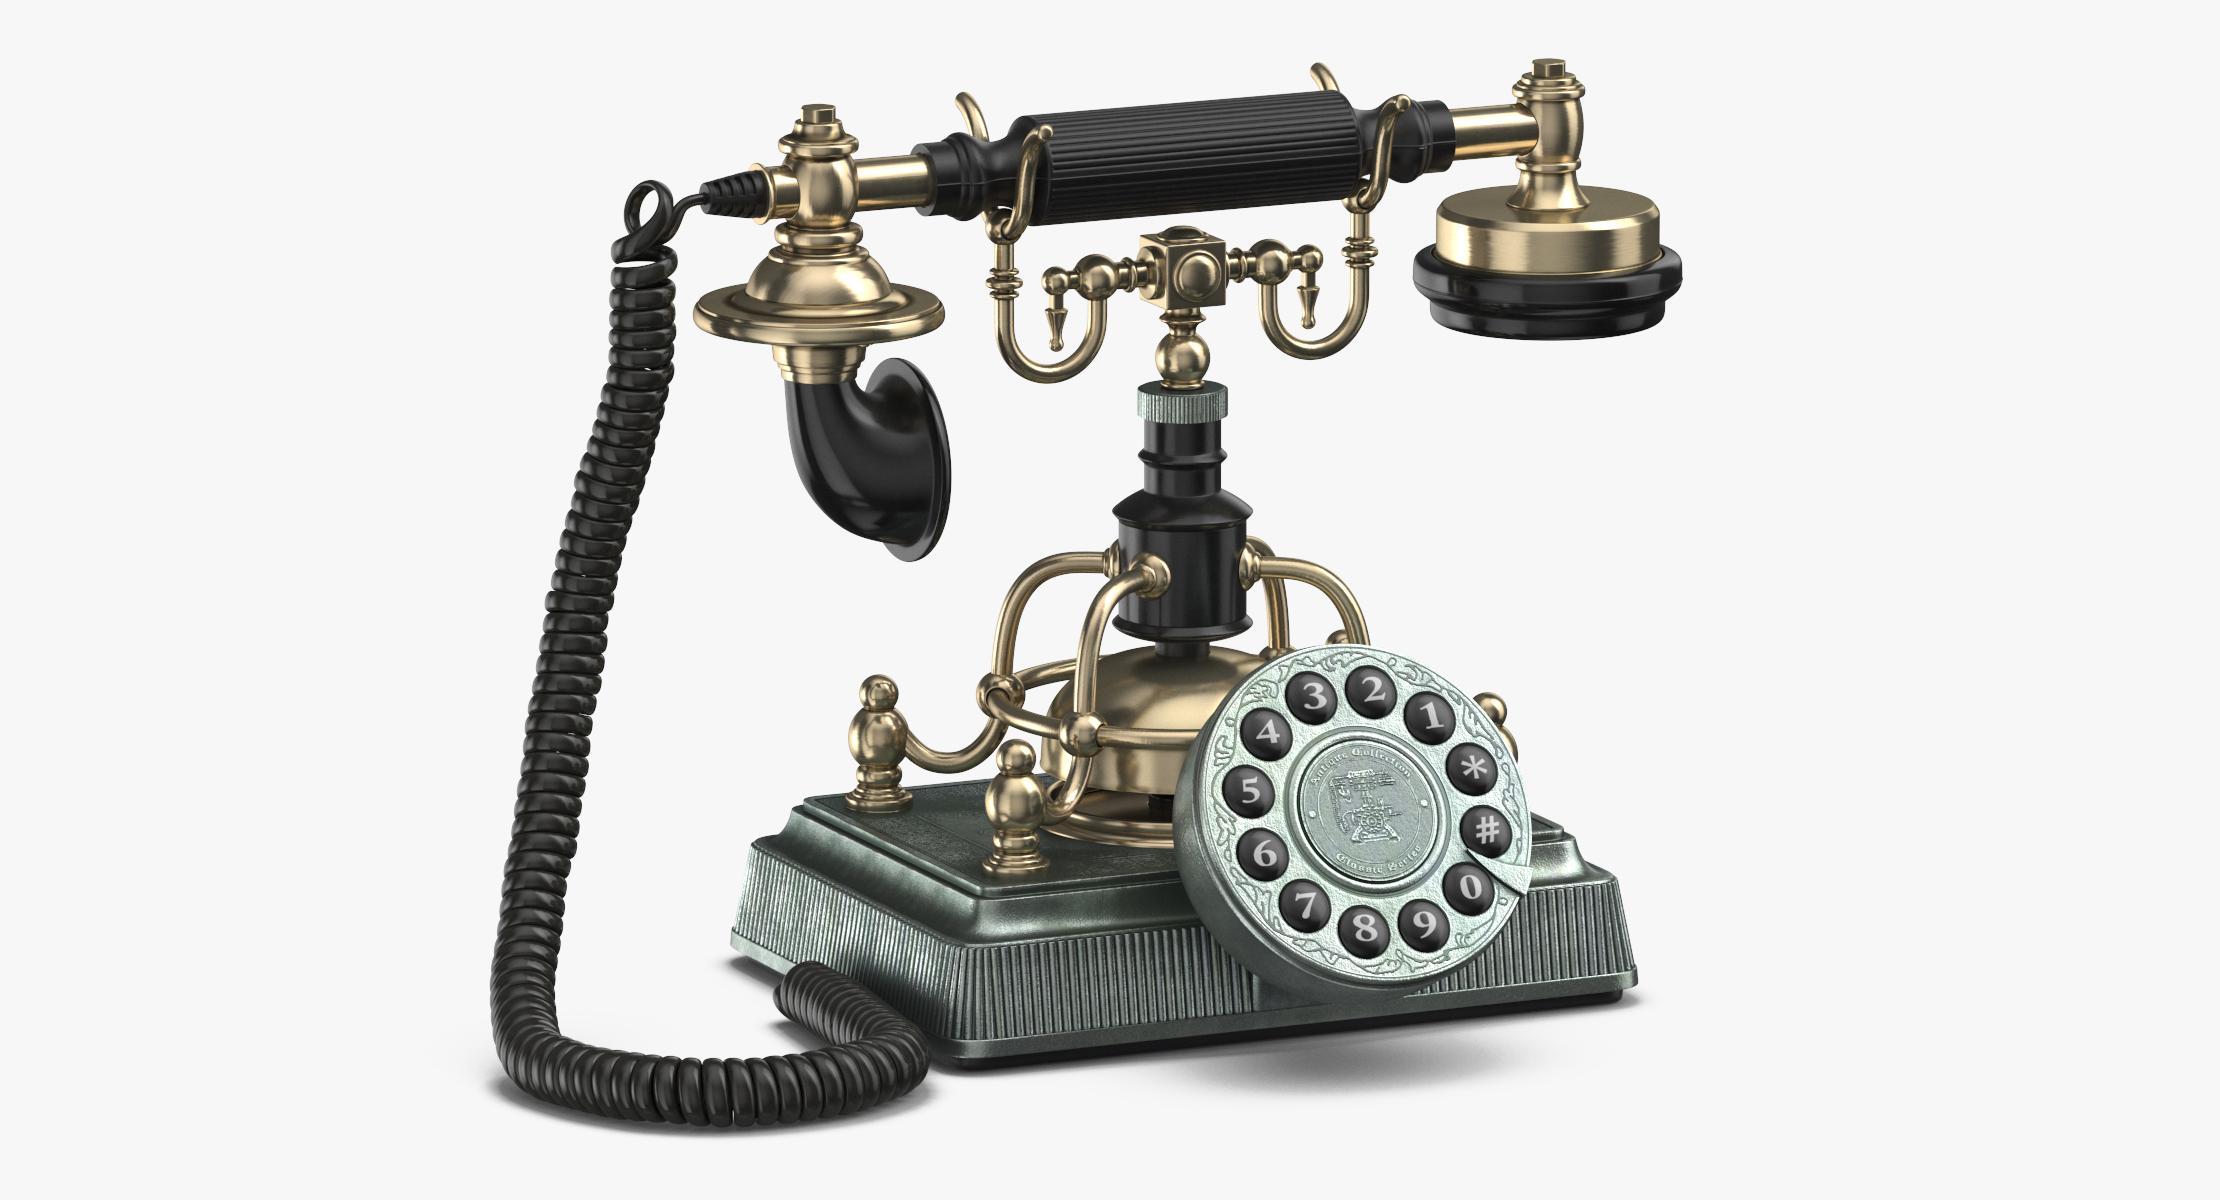 Retro Phone - reel 1